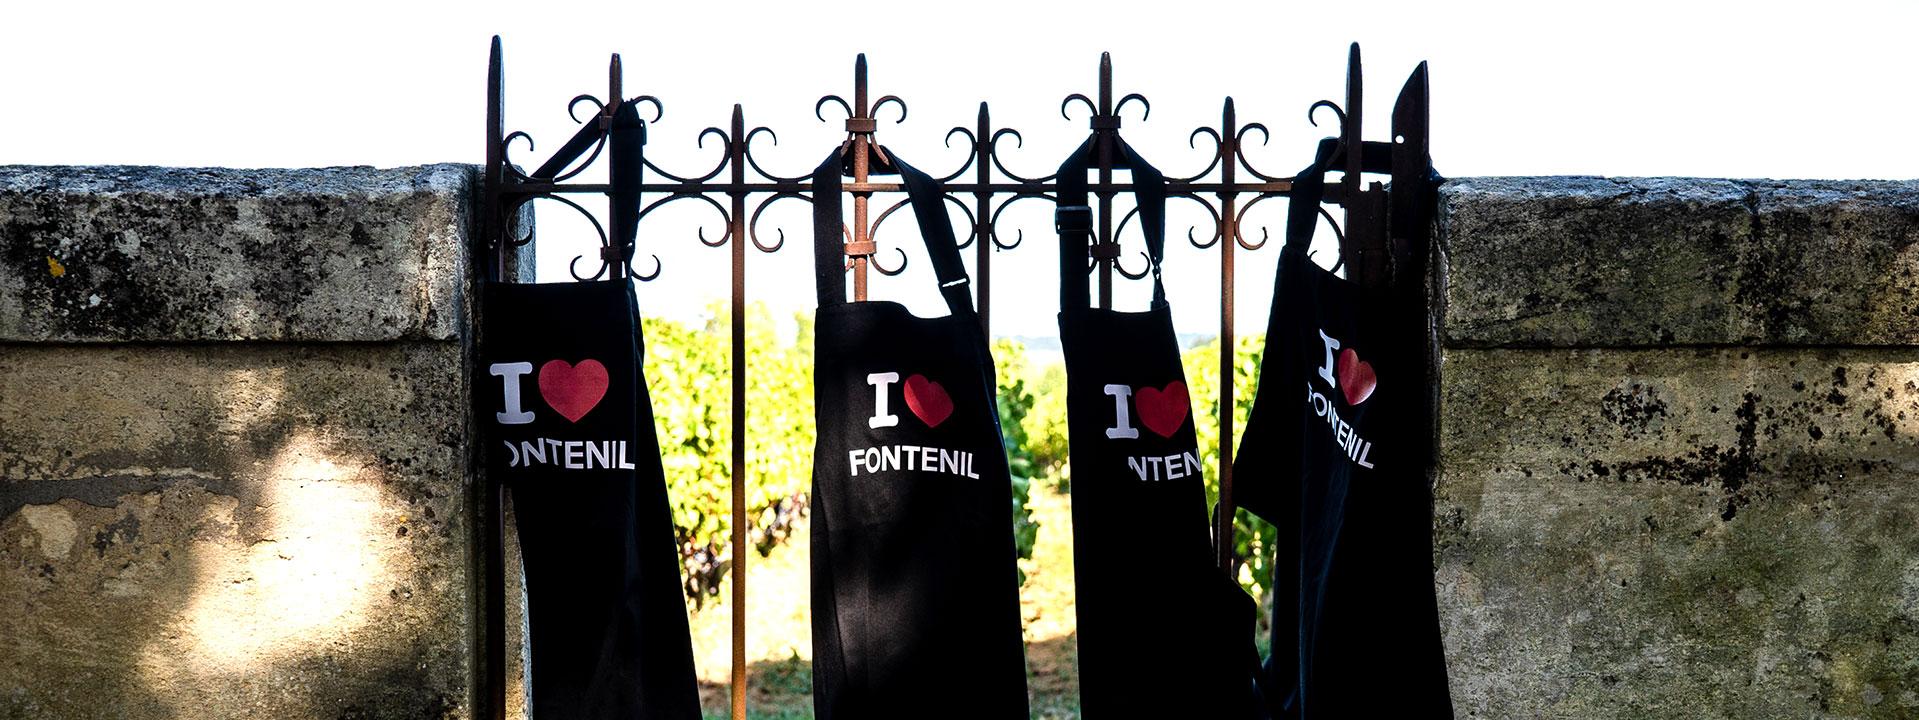 Château Fontenil 2007 - Rolland Collection